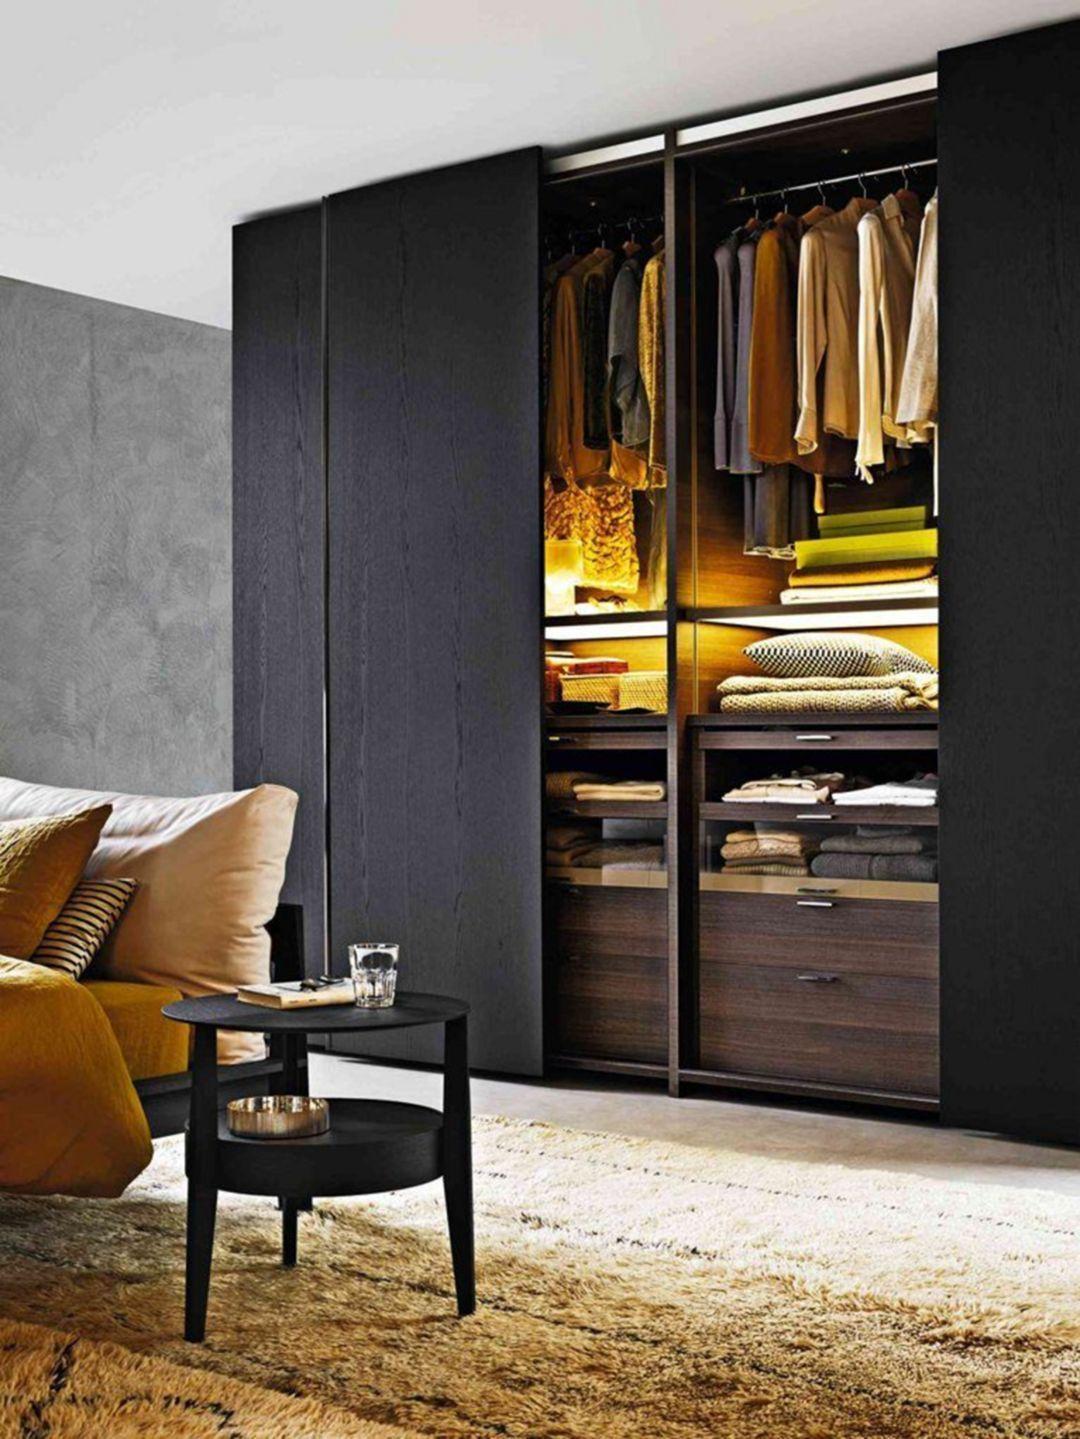 Top 30 Modern Wardrobe Design Ideas For Your Small Bedroom Decoor Wardrobe Design Bedroom Wardrobe Design Modern Bedroom Closet Design